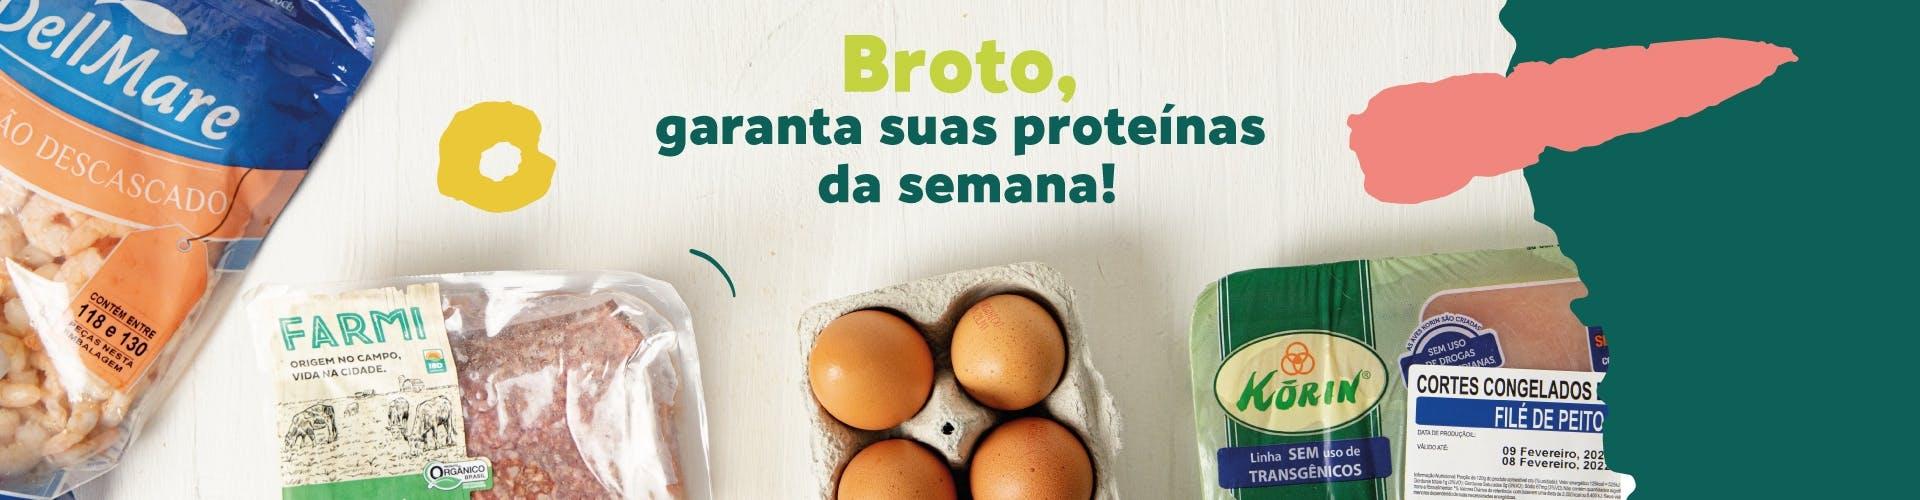 proteínas animais e vegetais